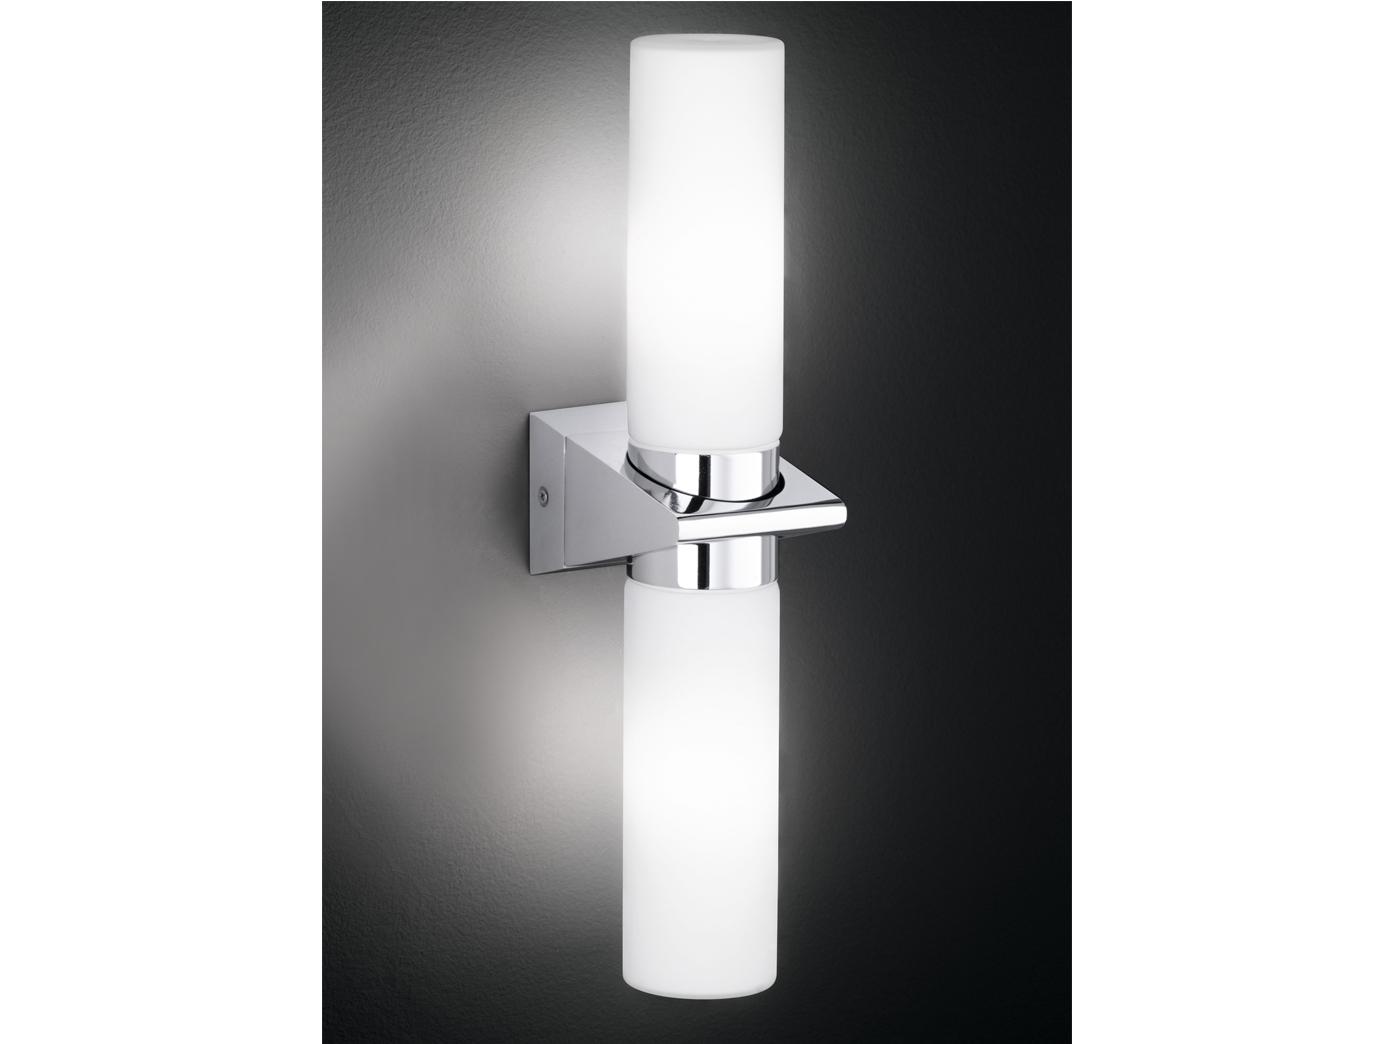 Lampada da parete parete parete lampada muro applique roto cromo